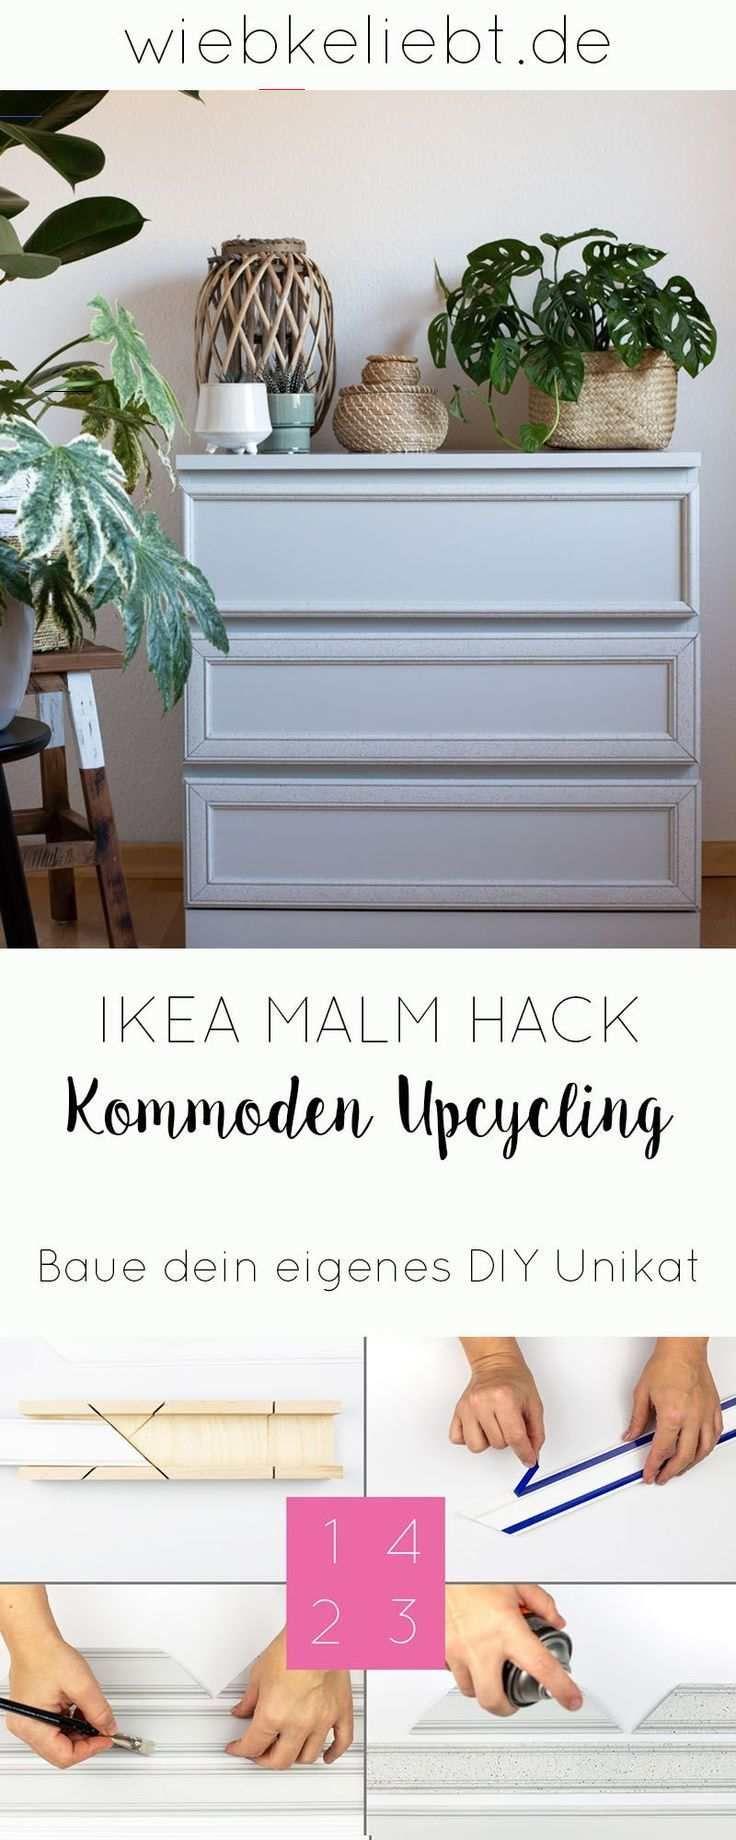 Diy Ikea Hack Upcycling Mobel Selber Bauen Werbung Diy Blog Do It Yourself Anleitungen Zum Lernturmikea In 2020 Upcycling Mobel Malm Hack Ikea Malm Hack